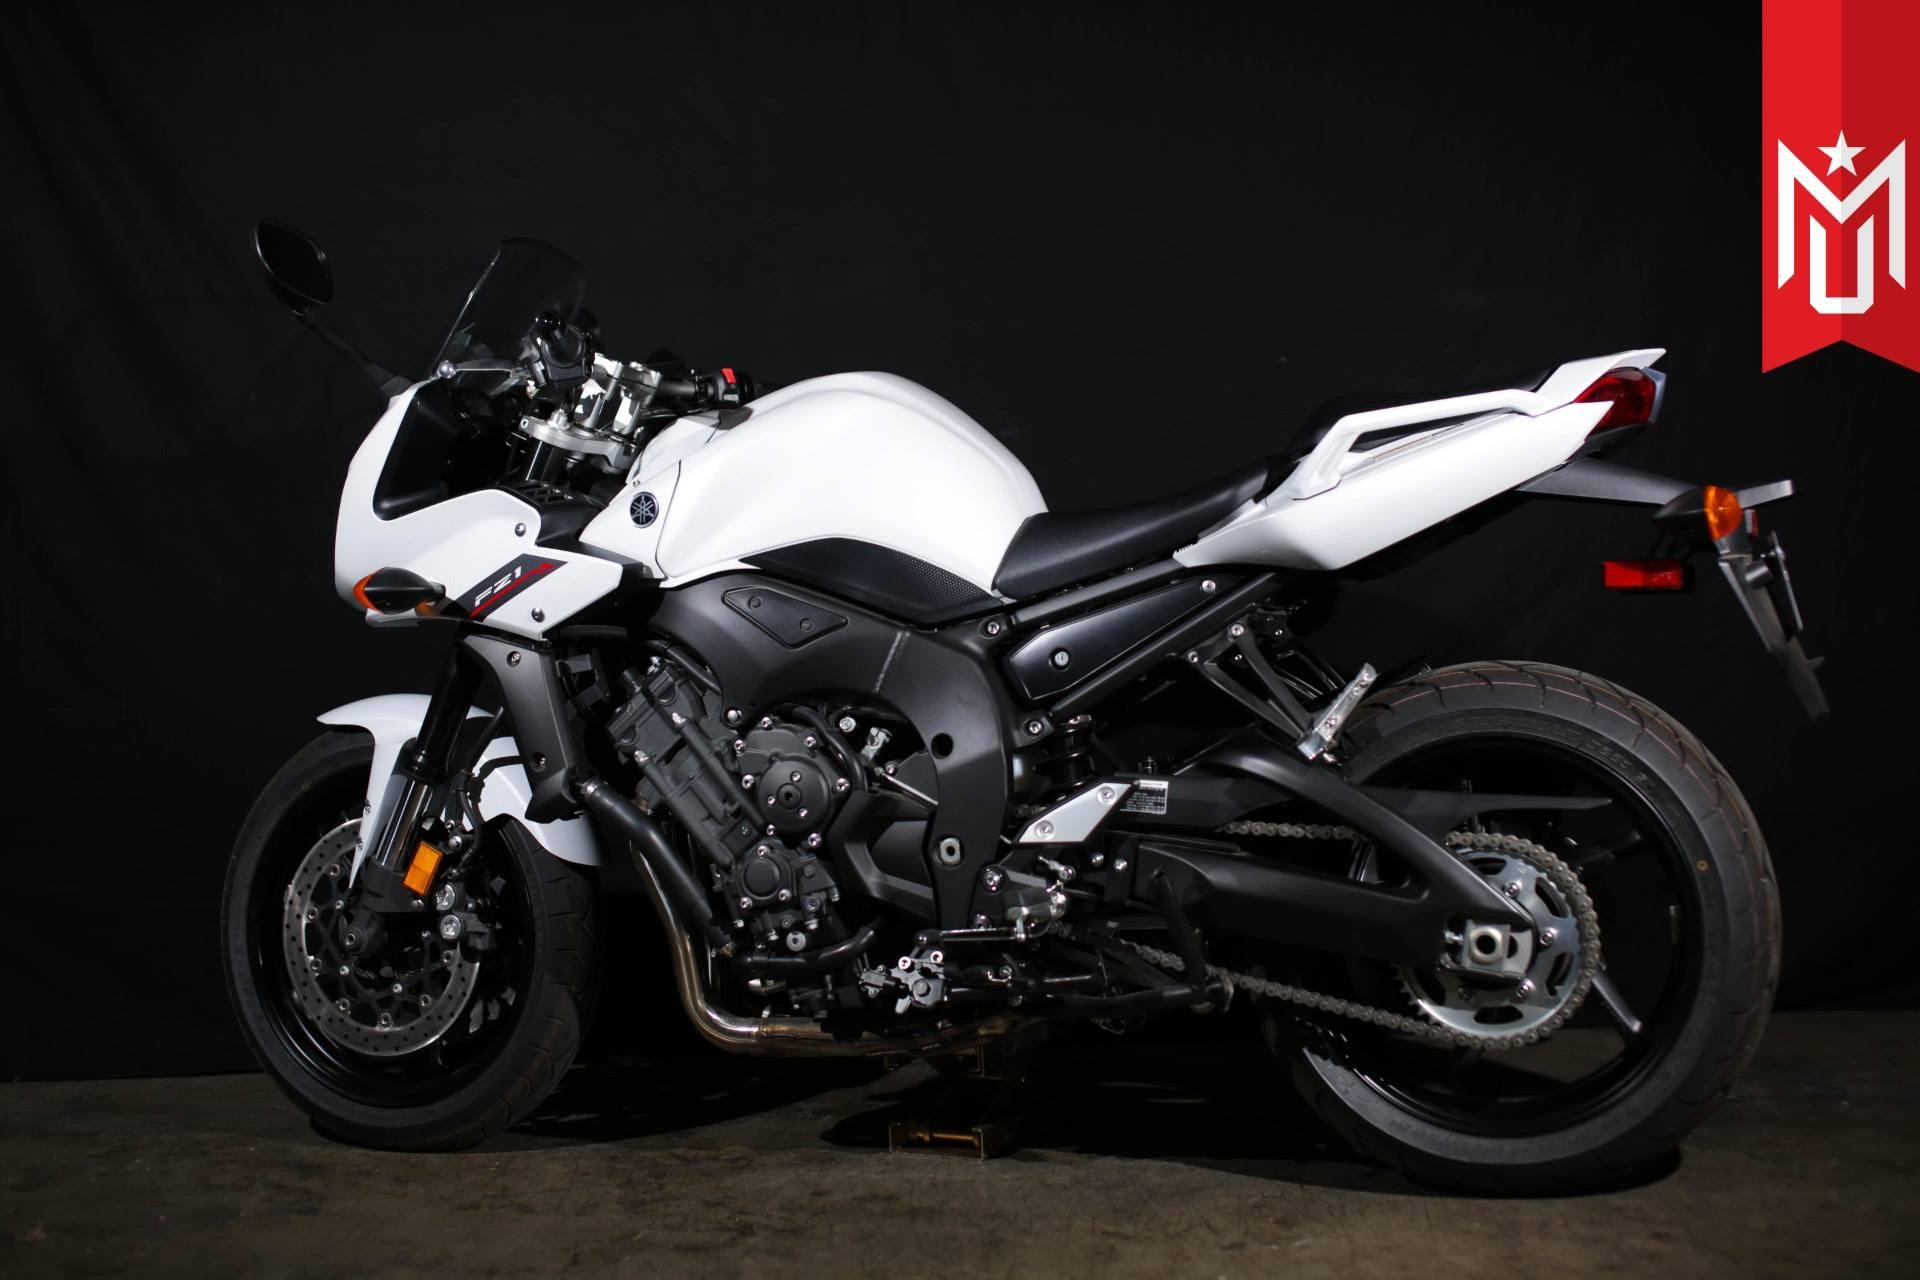 2014 Yamaha FZ1 in La Habra, California